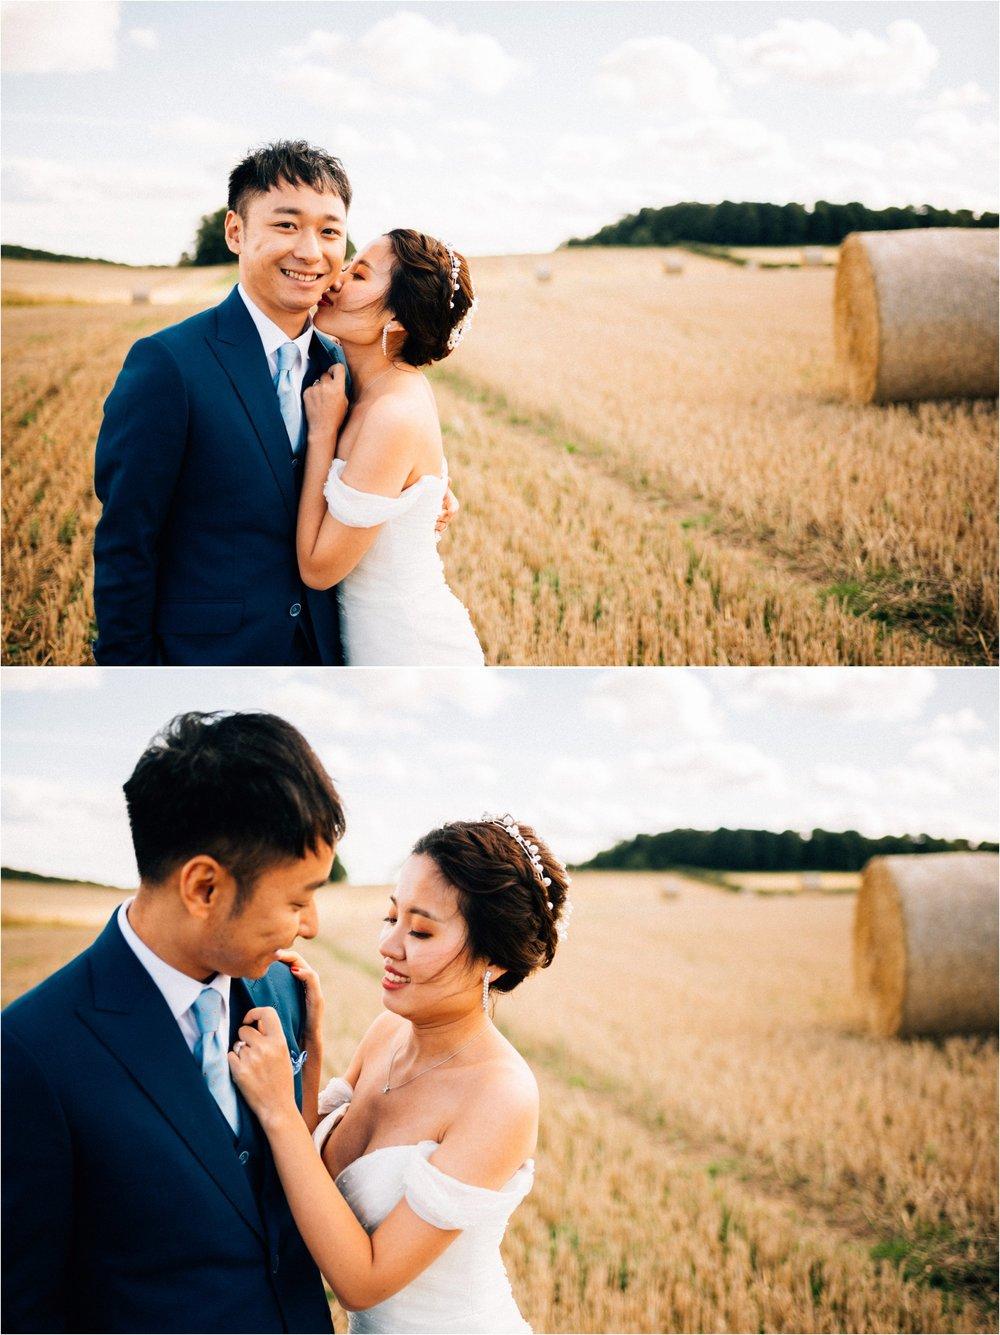 York city elopement wedding photographer_0201.jpg